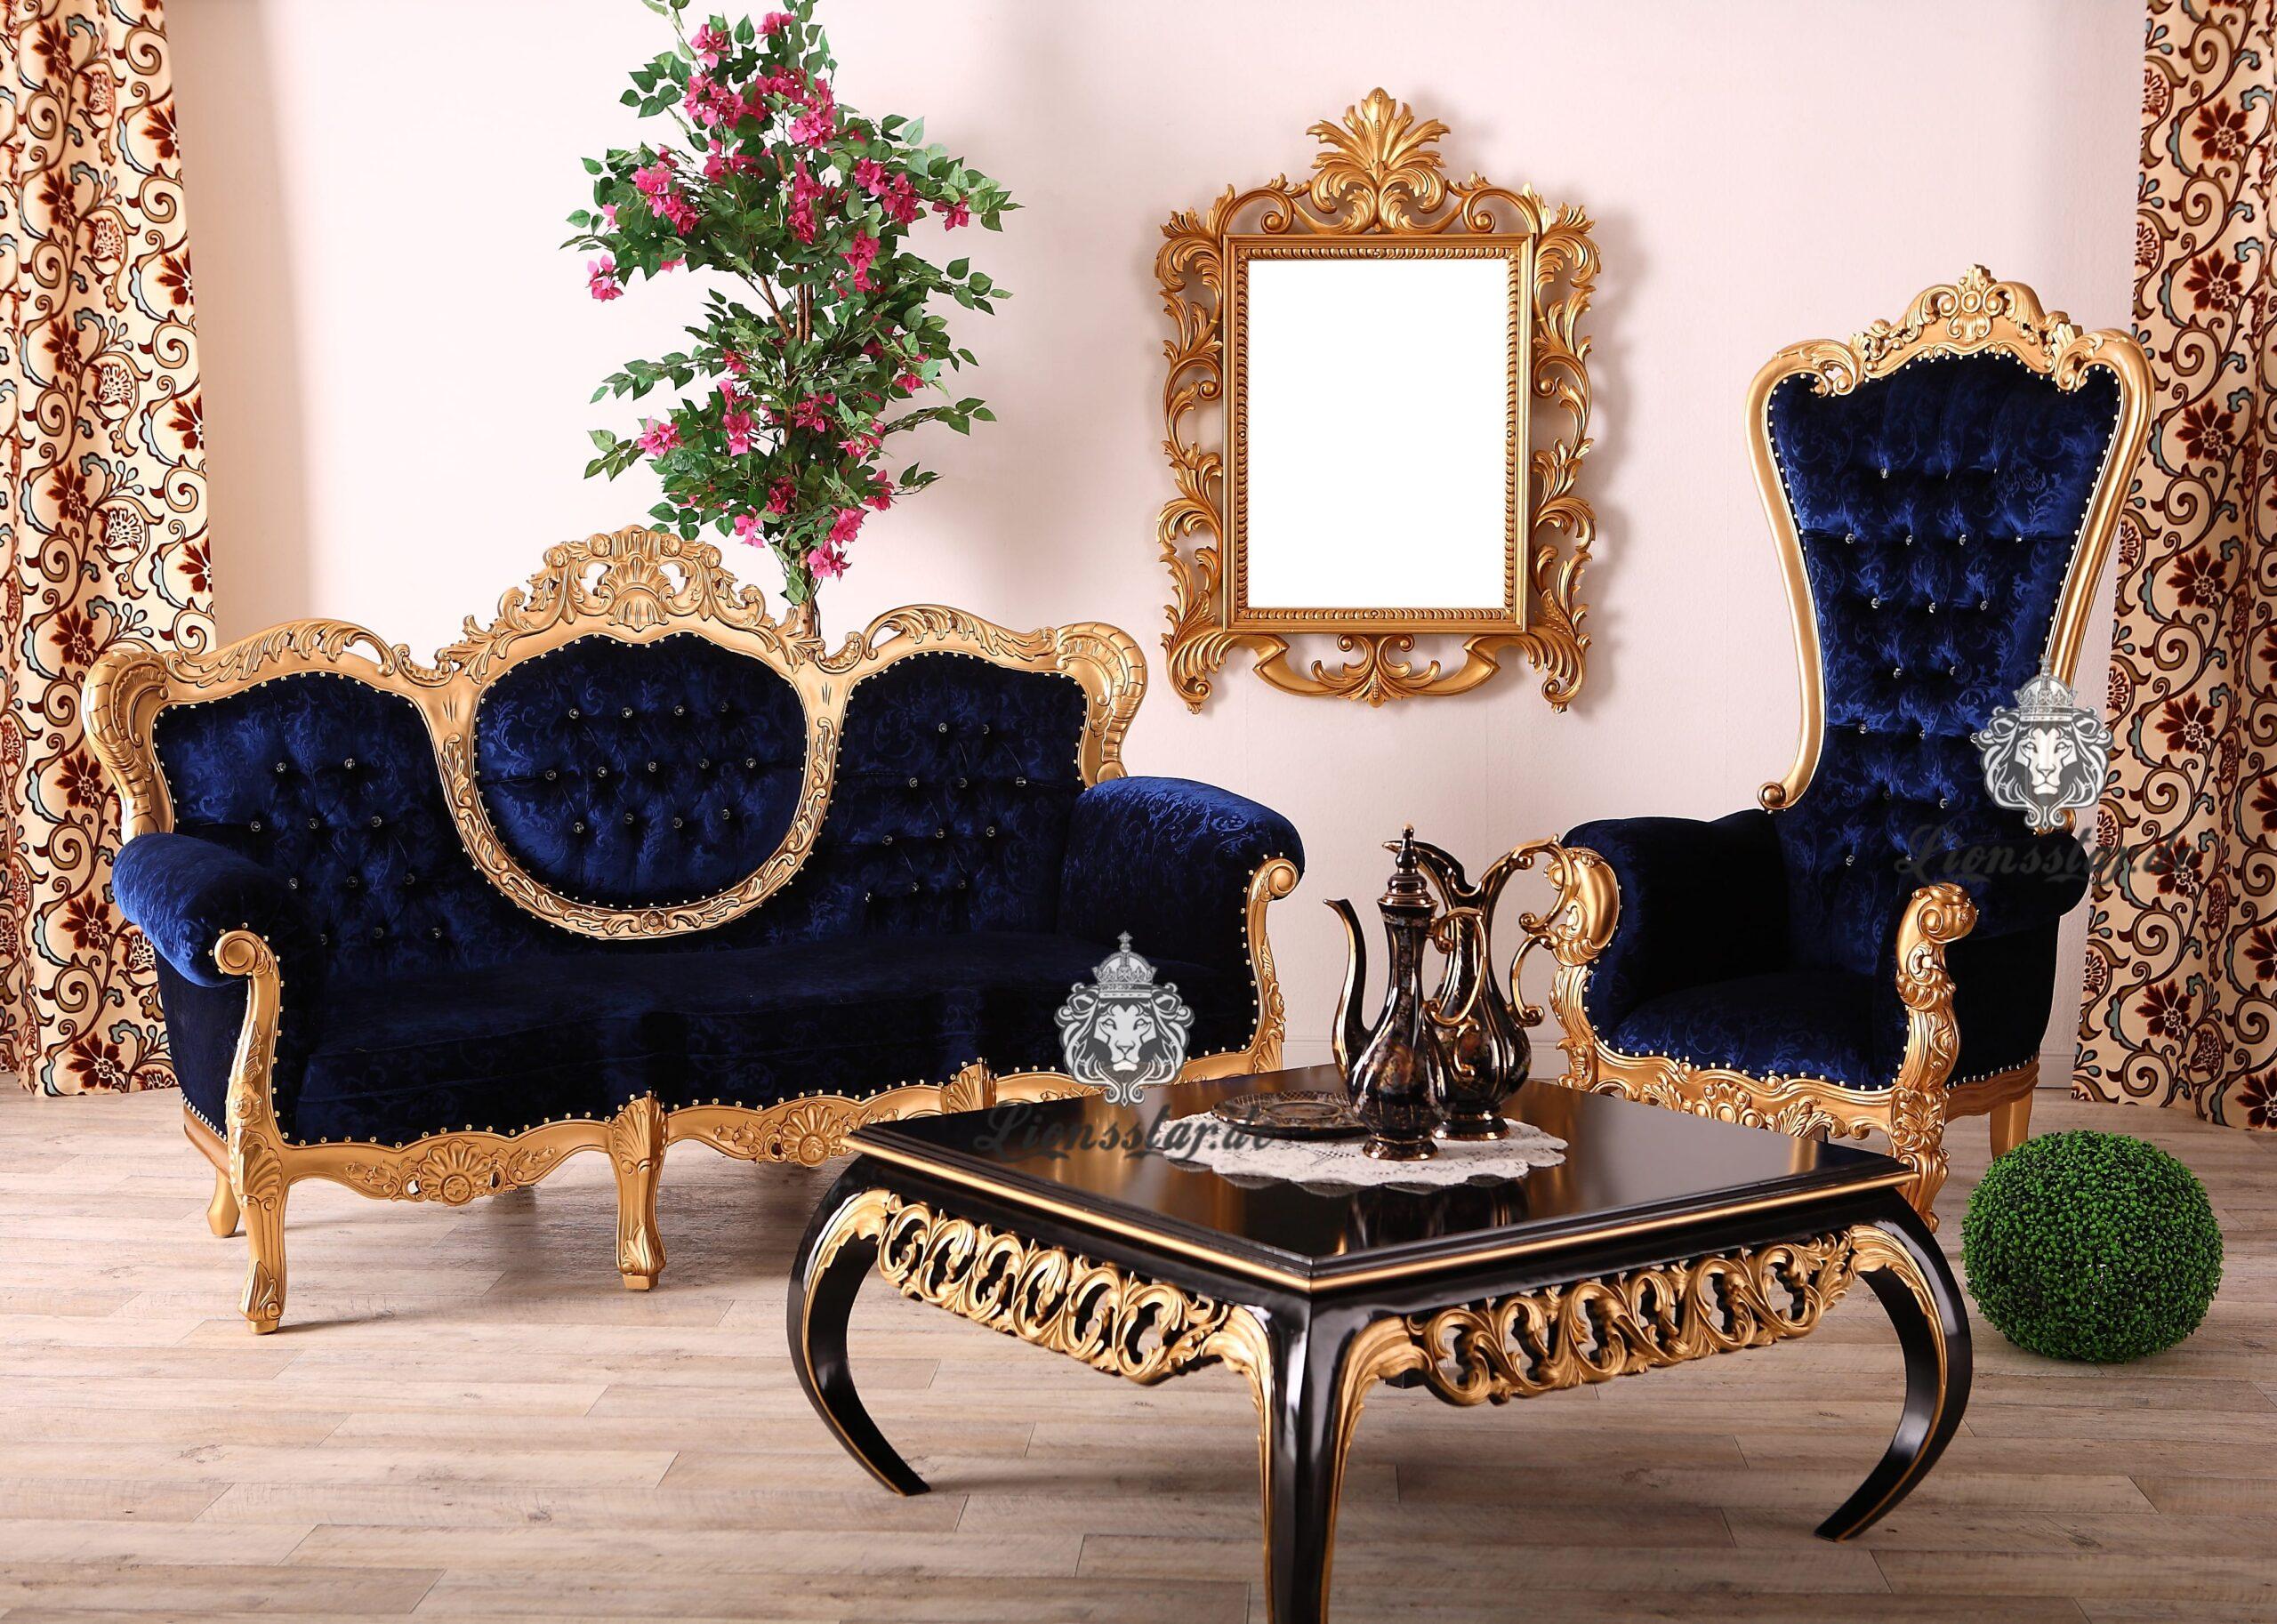 Full Size of Recamiere Barock Chaiselongue Rot Boudoir Diplomatie Bett Sofa Mit Wohnzimmer Recamiere Barock